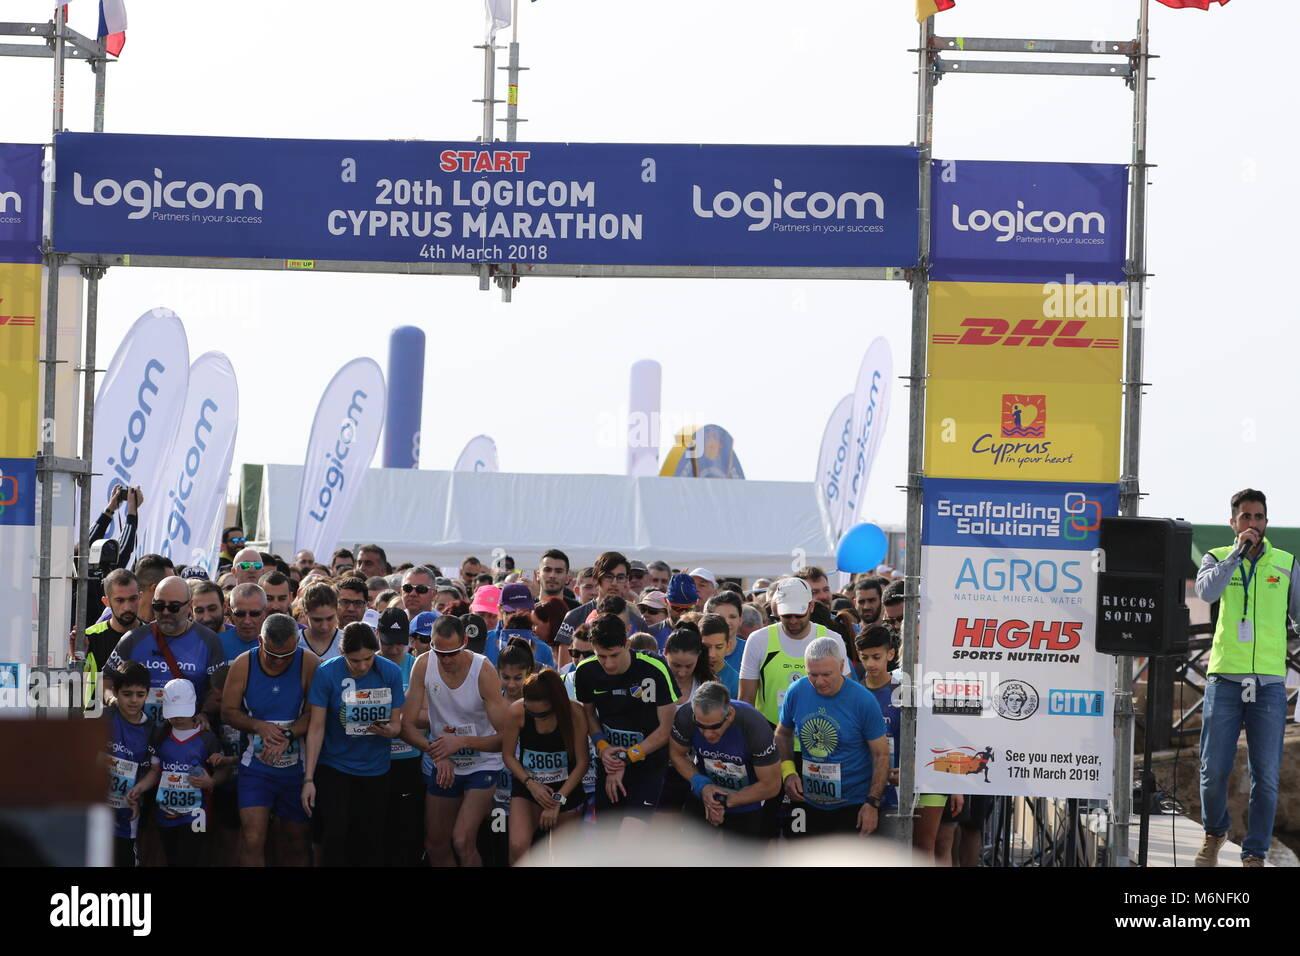 20th Logicom Cyprus marathon, half marathon, 10KM, 5KM (04/03/2018), Paphos, Cyprus, Europe - Stock Image